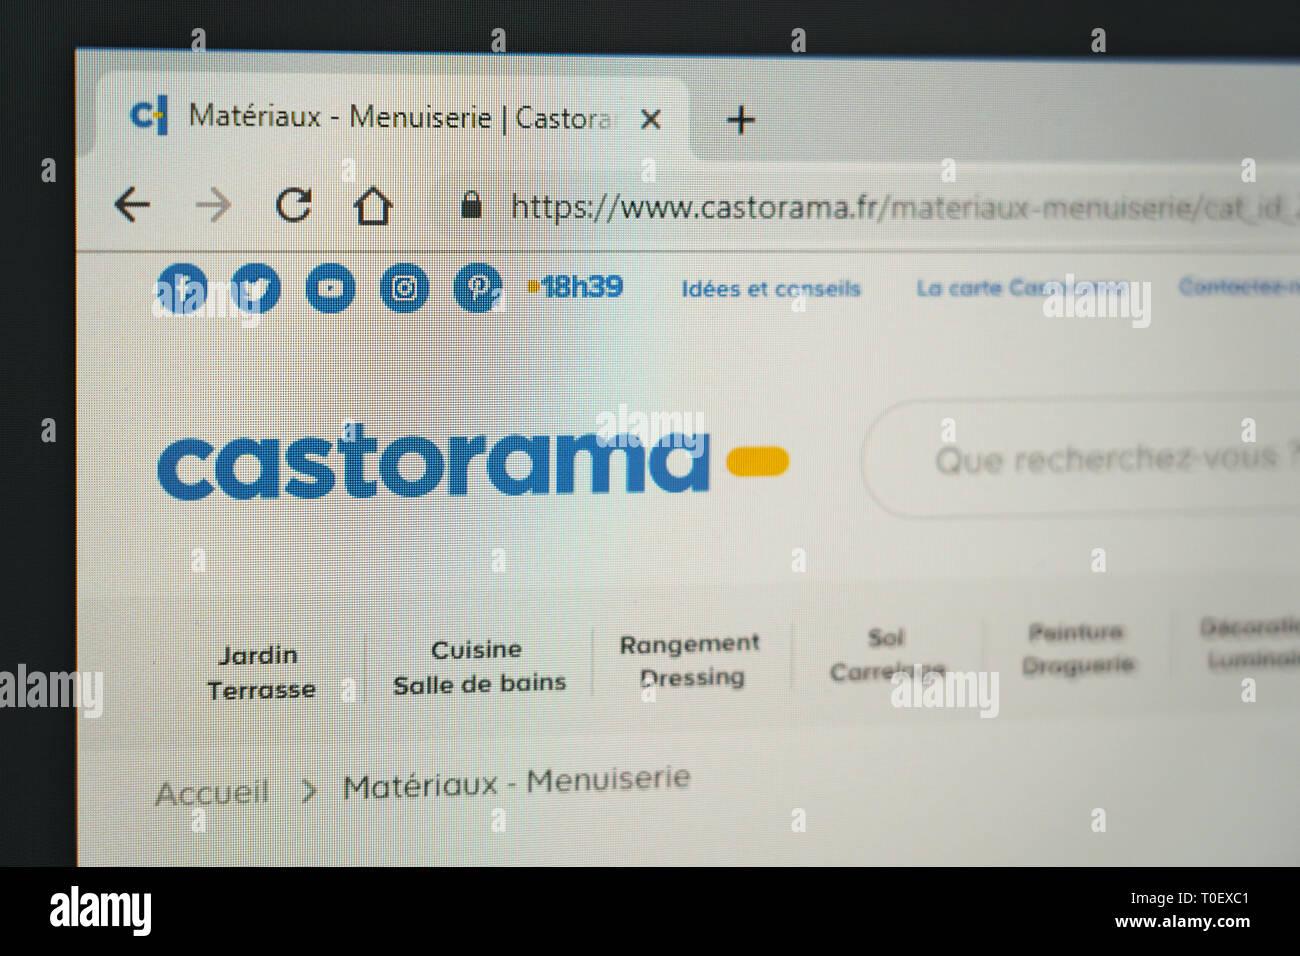 castorama website screenshot - Stock Image